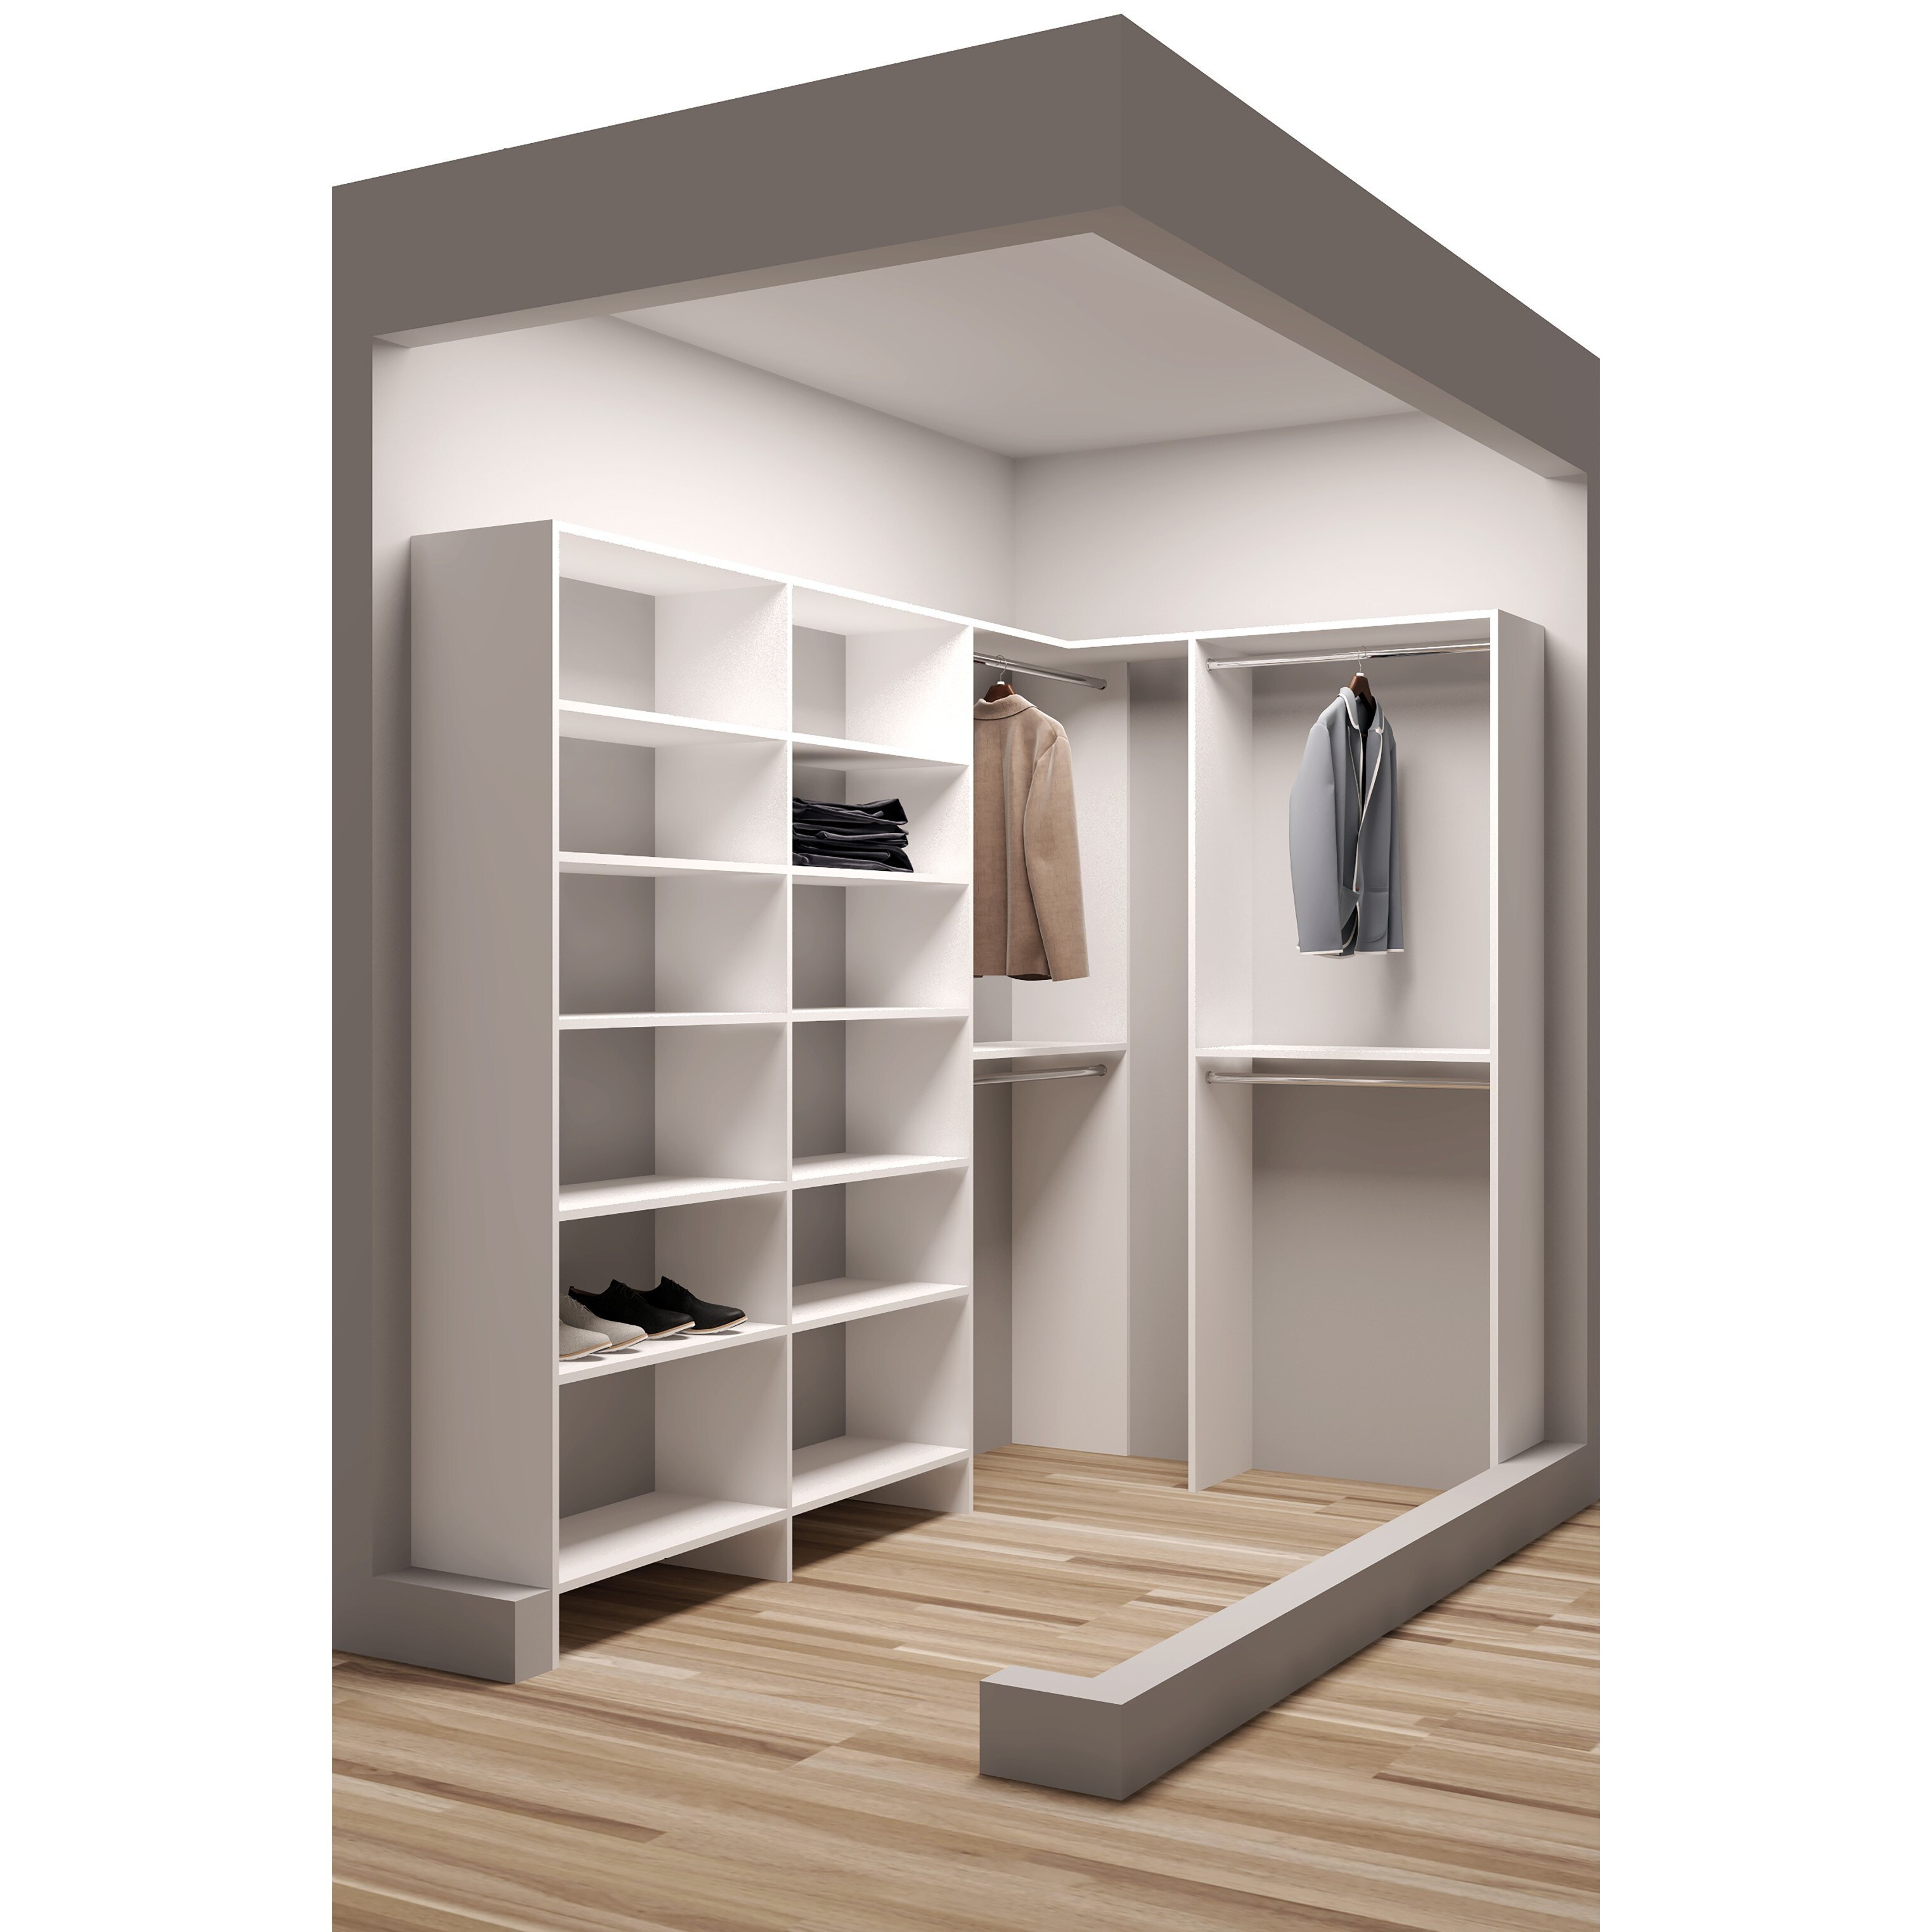 Tidysquares White Wood 59 5 X 99 Walk In Closet System